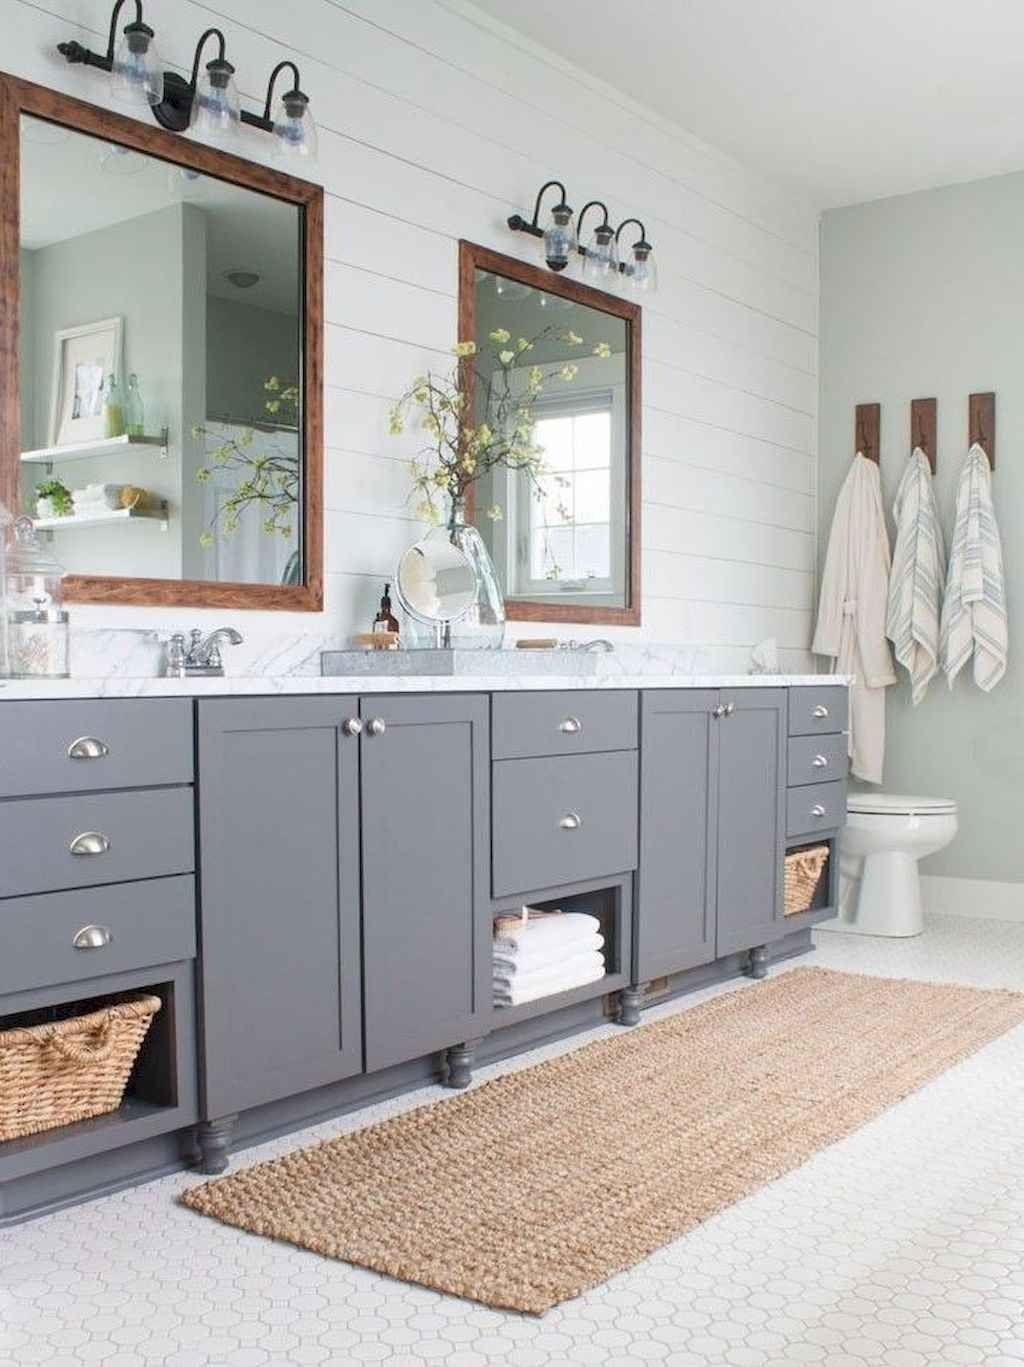 125 Stunning Farmhouse Bathroom Vanity Decor Ideas Bathroom Vanity Decor Bathroom Vanity Farmhouse Bathroom Vanity